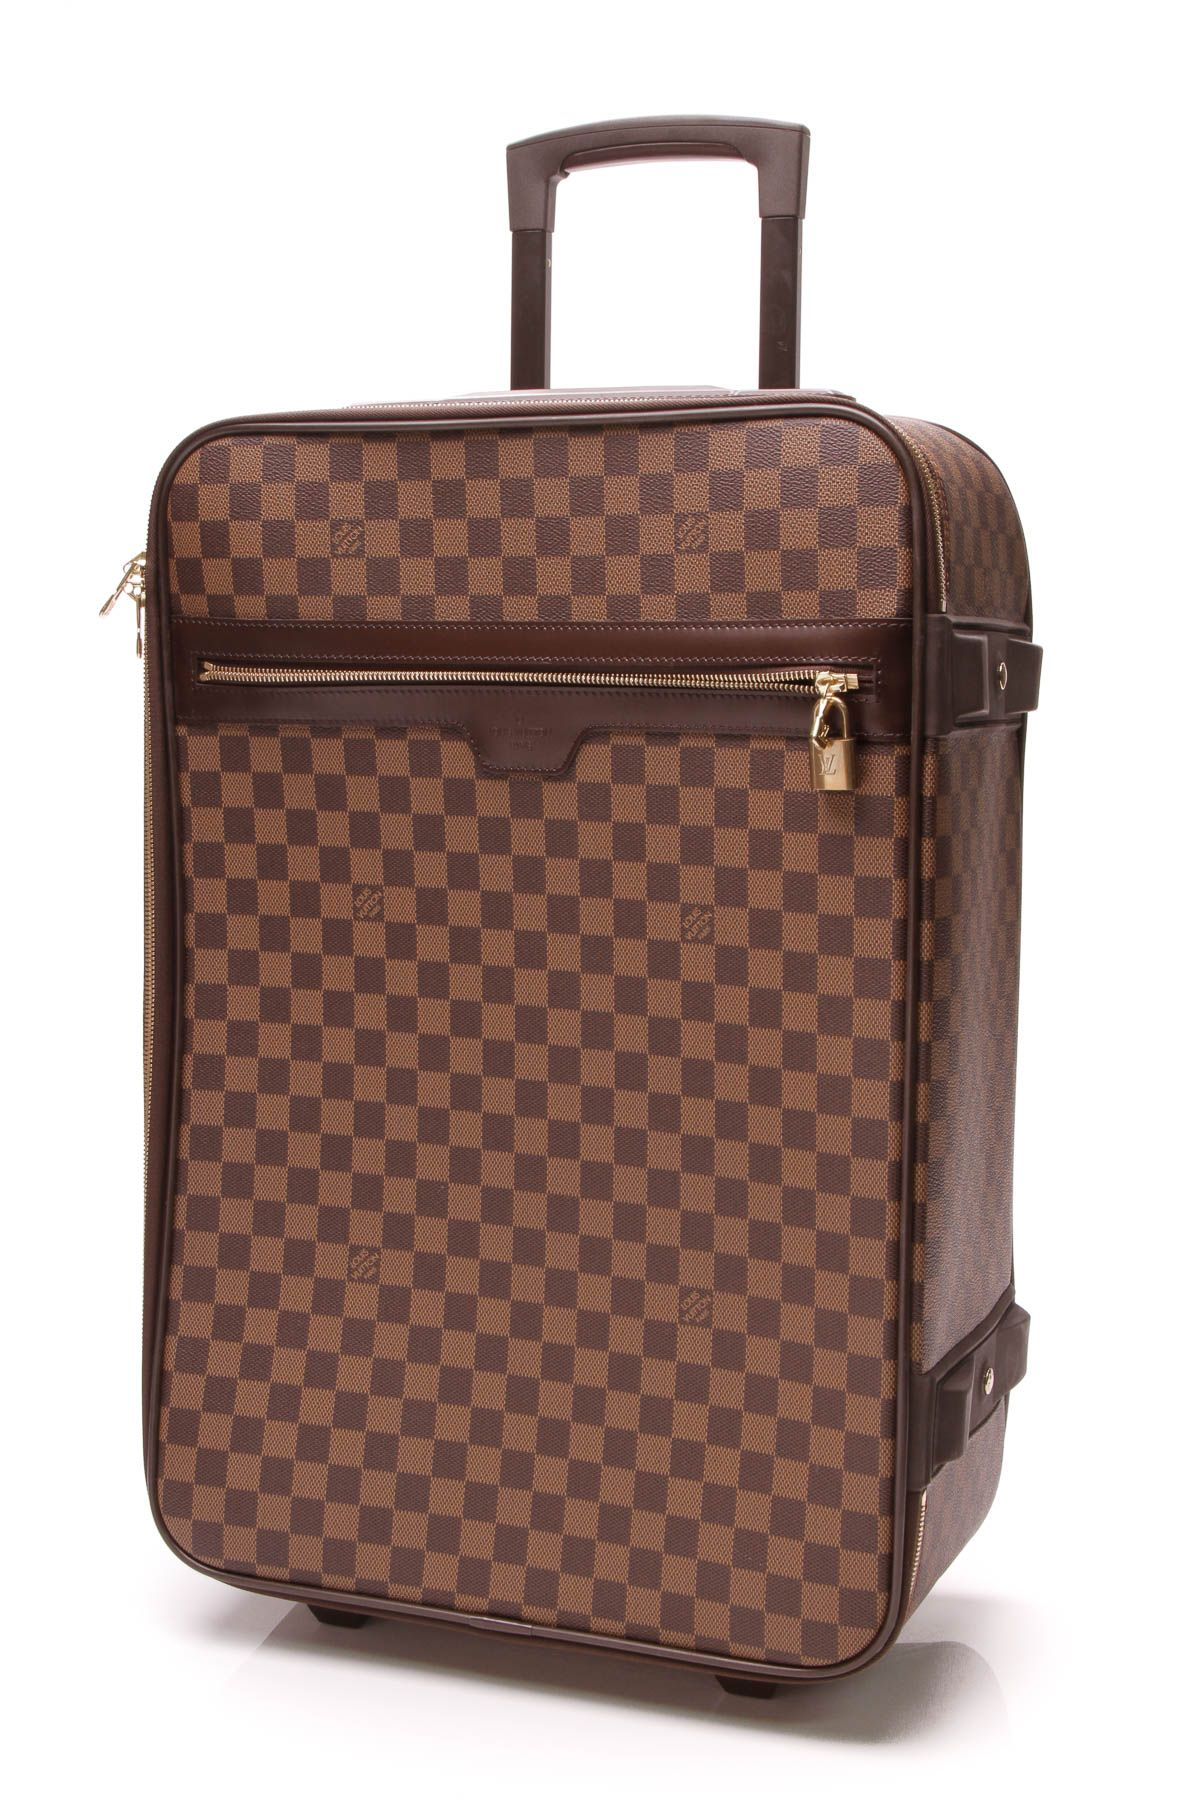 1cceb3fdf622 Louis Vuitton Pegase 60 Rolling Luggage - Damier Ebene